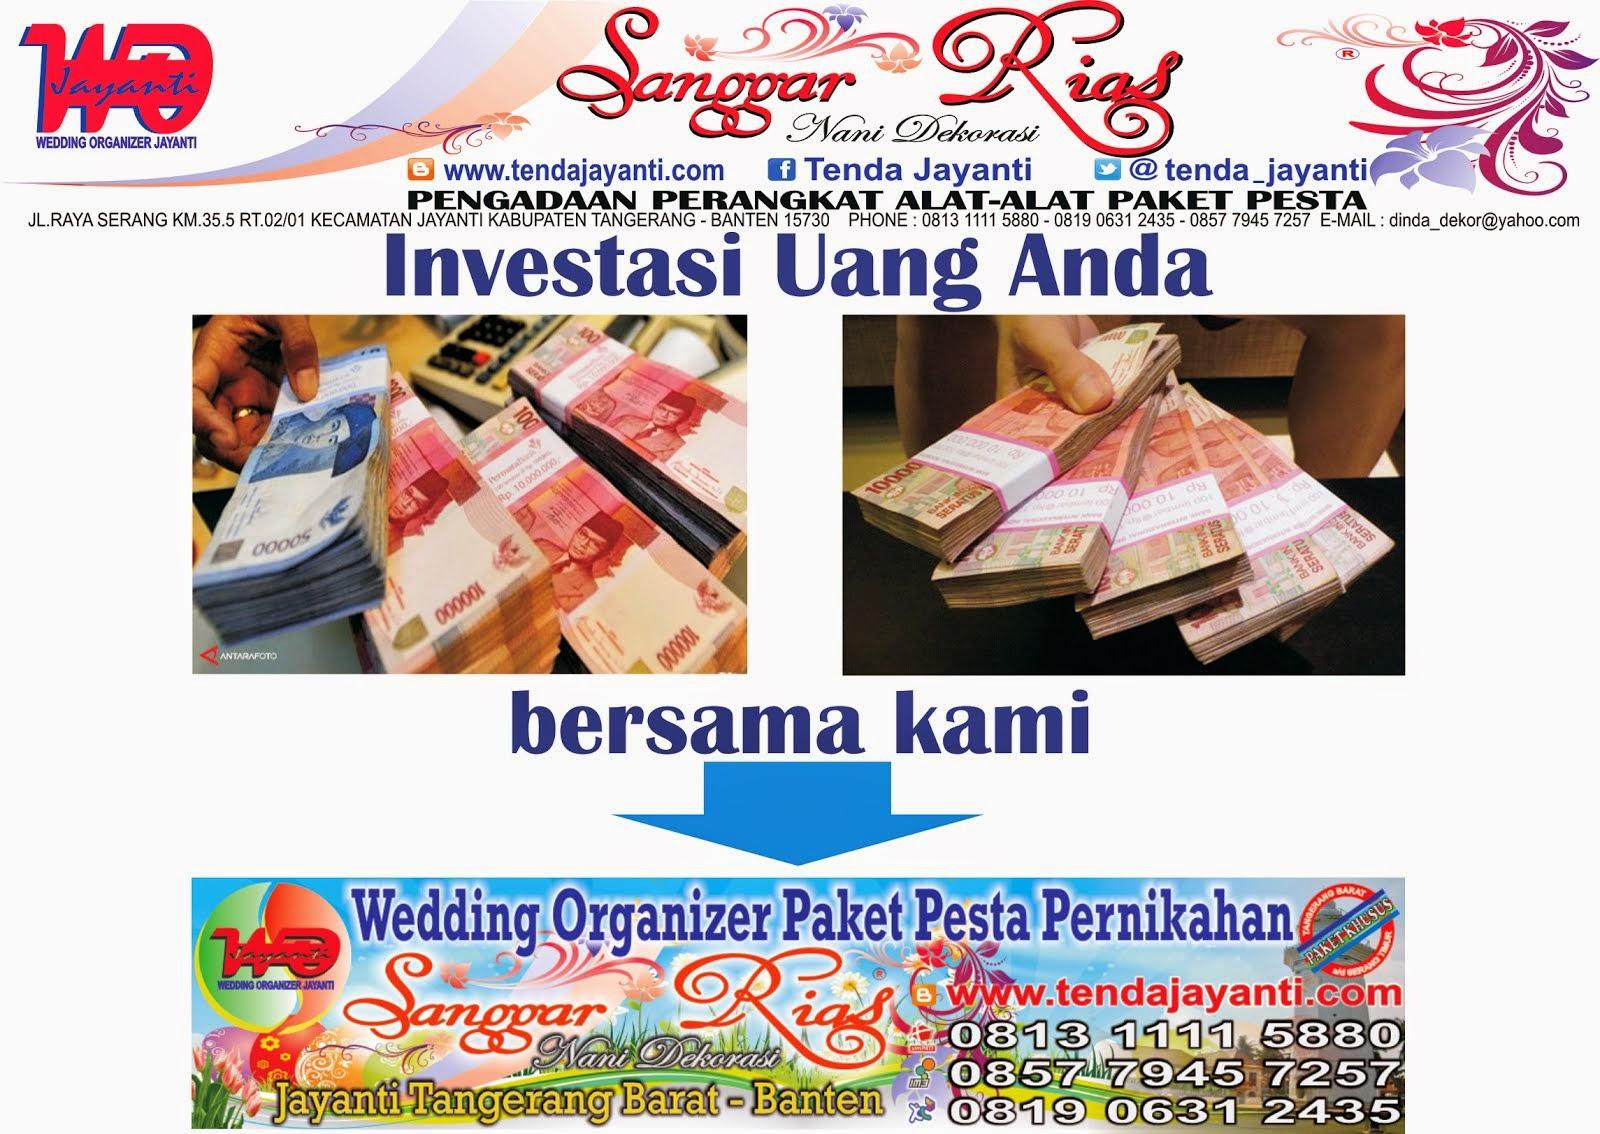 Investasi Uang Anda